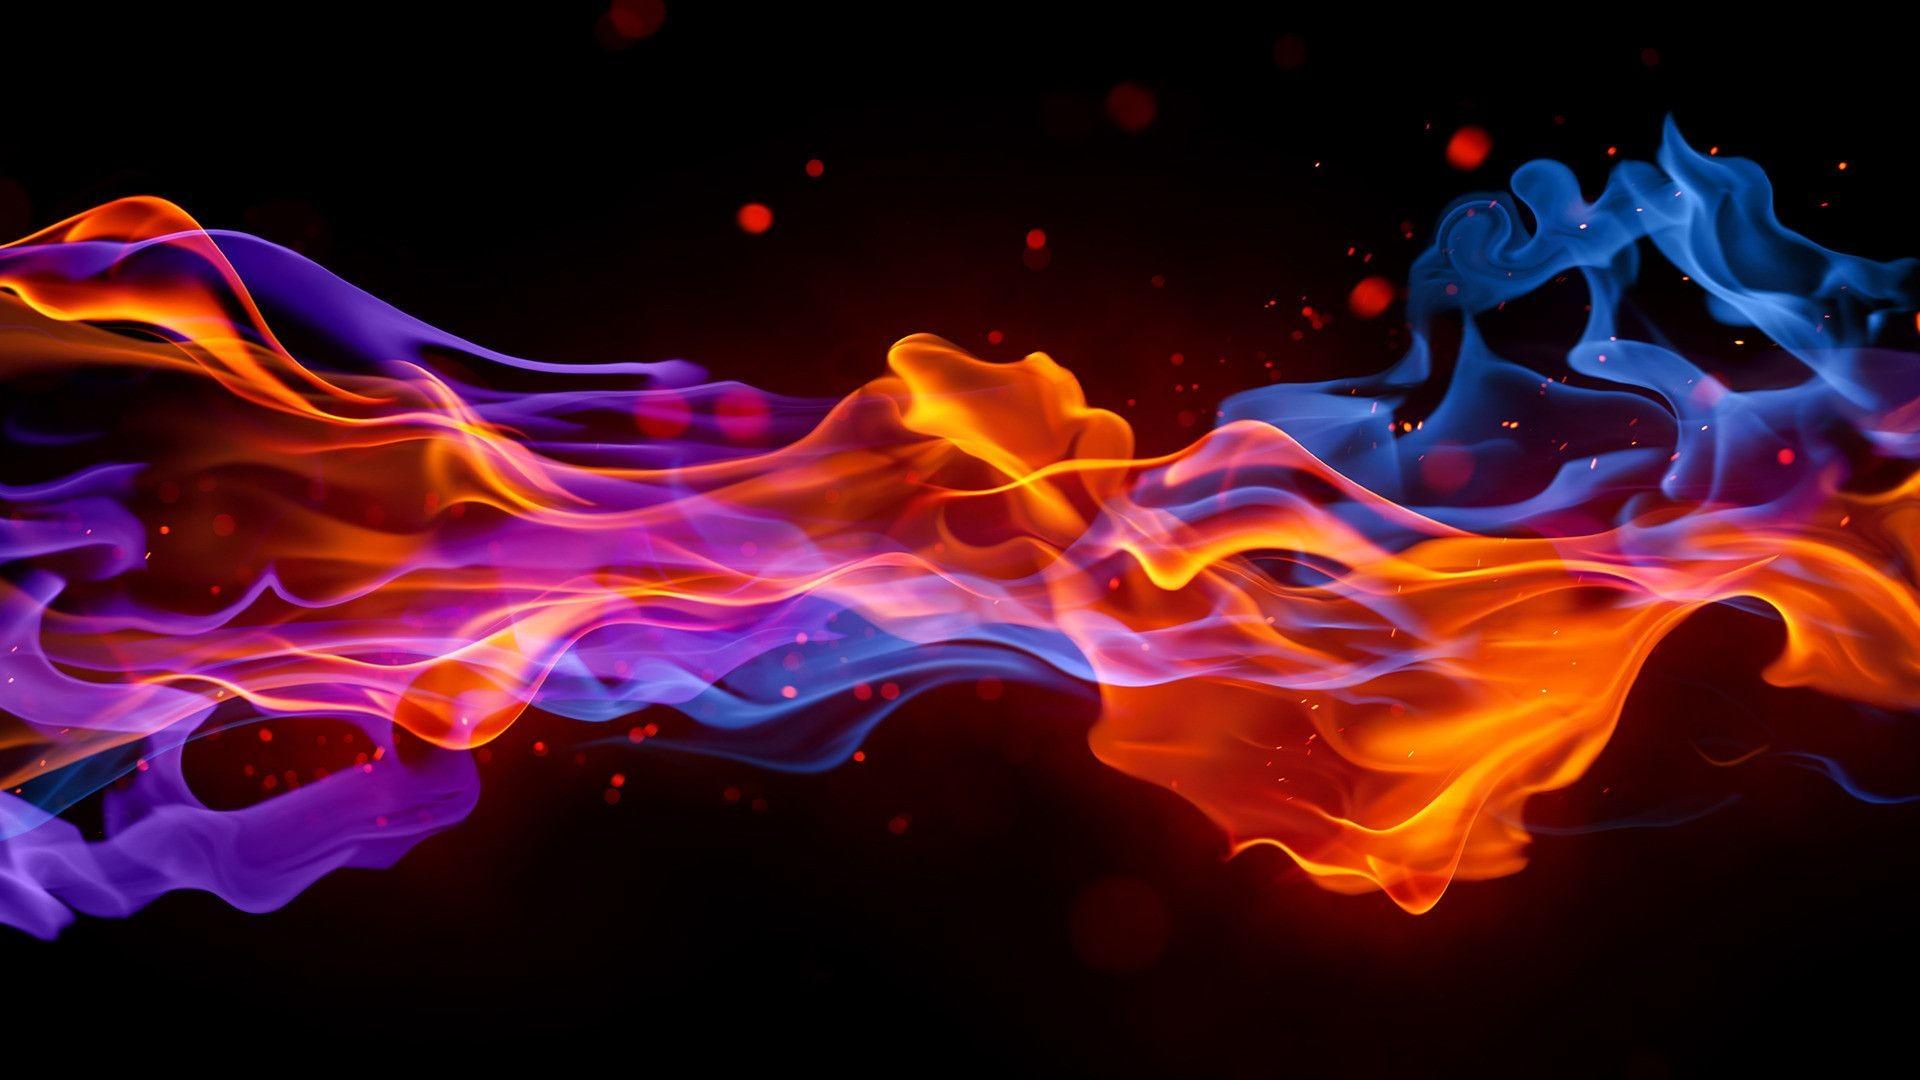 Blue Fire HD Wallpaper